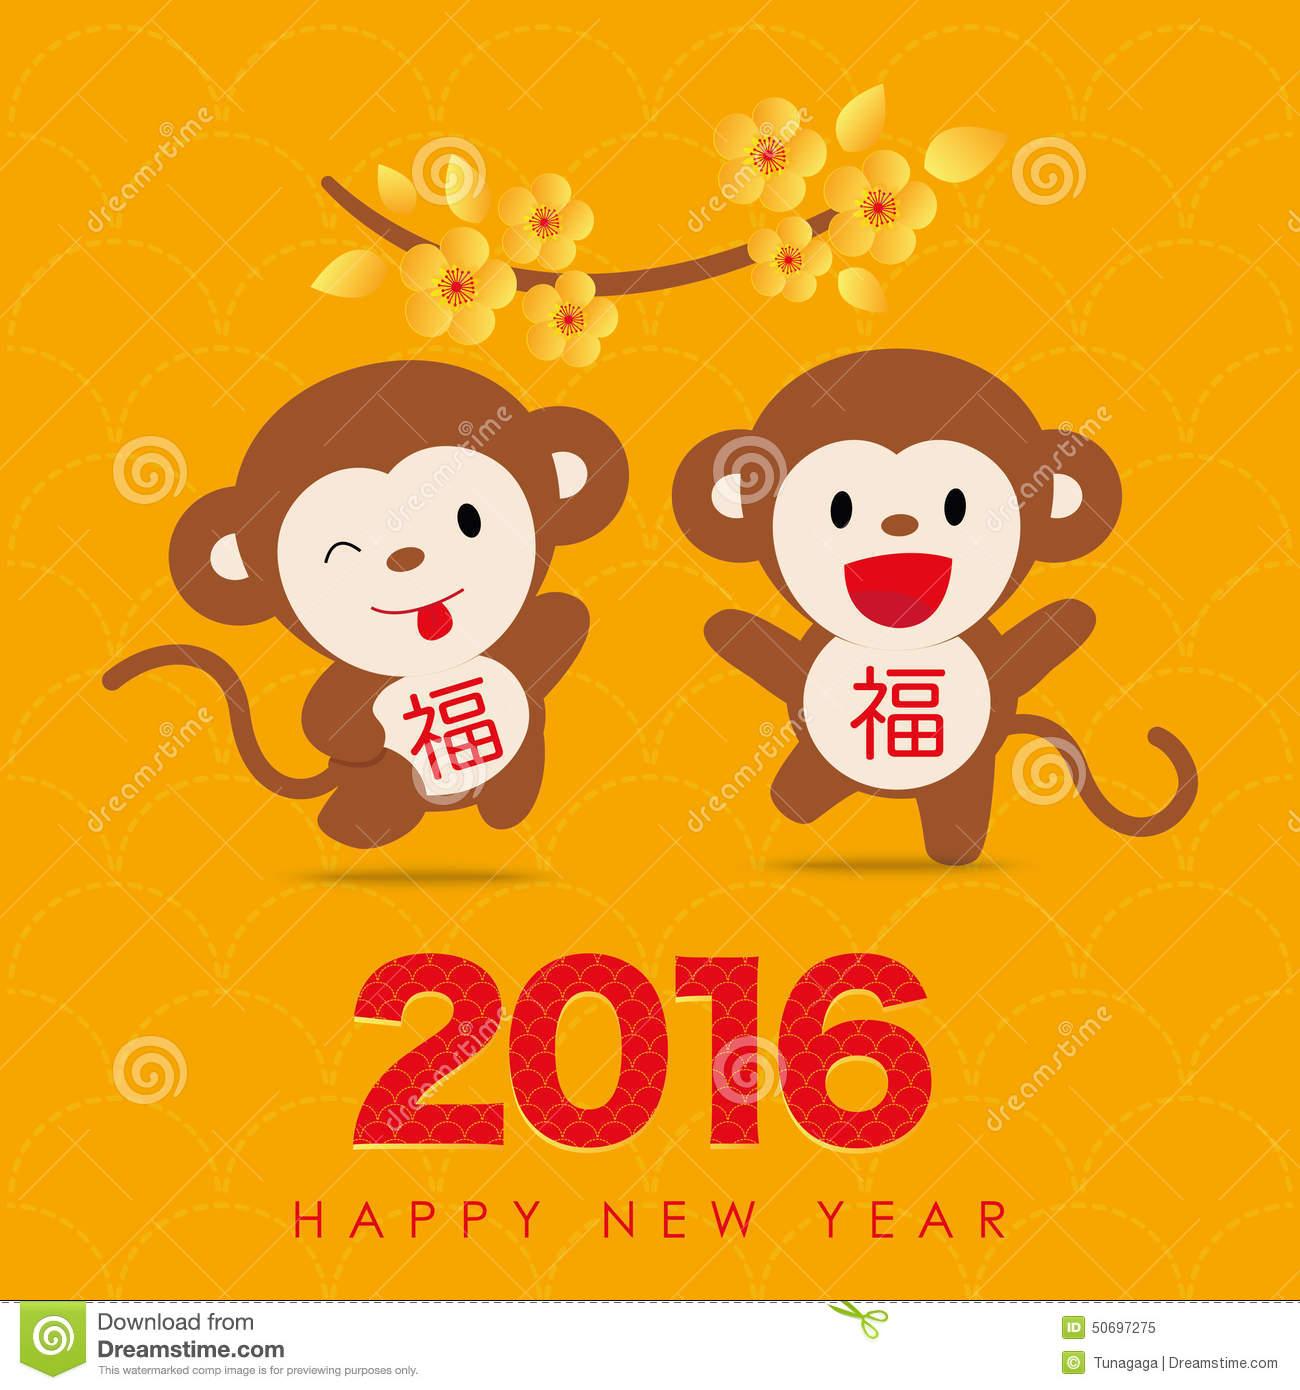 Chinese new year 2016 dates